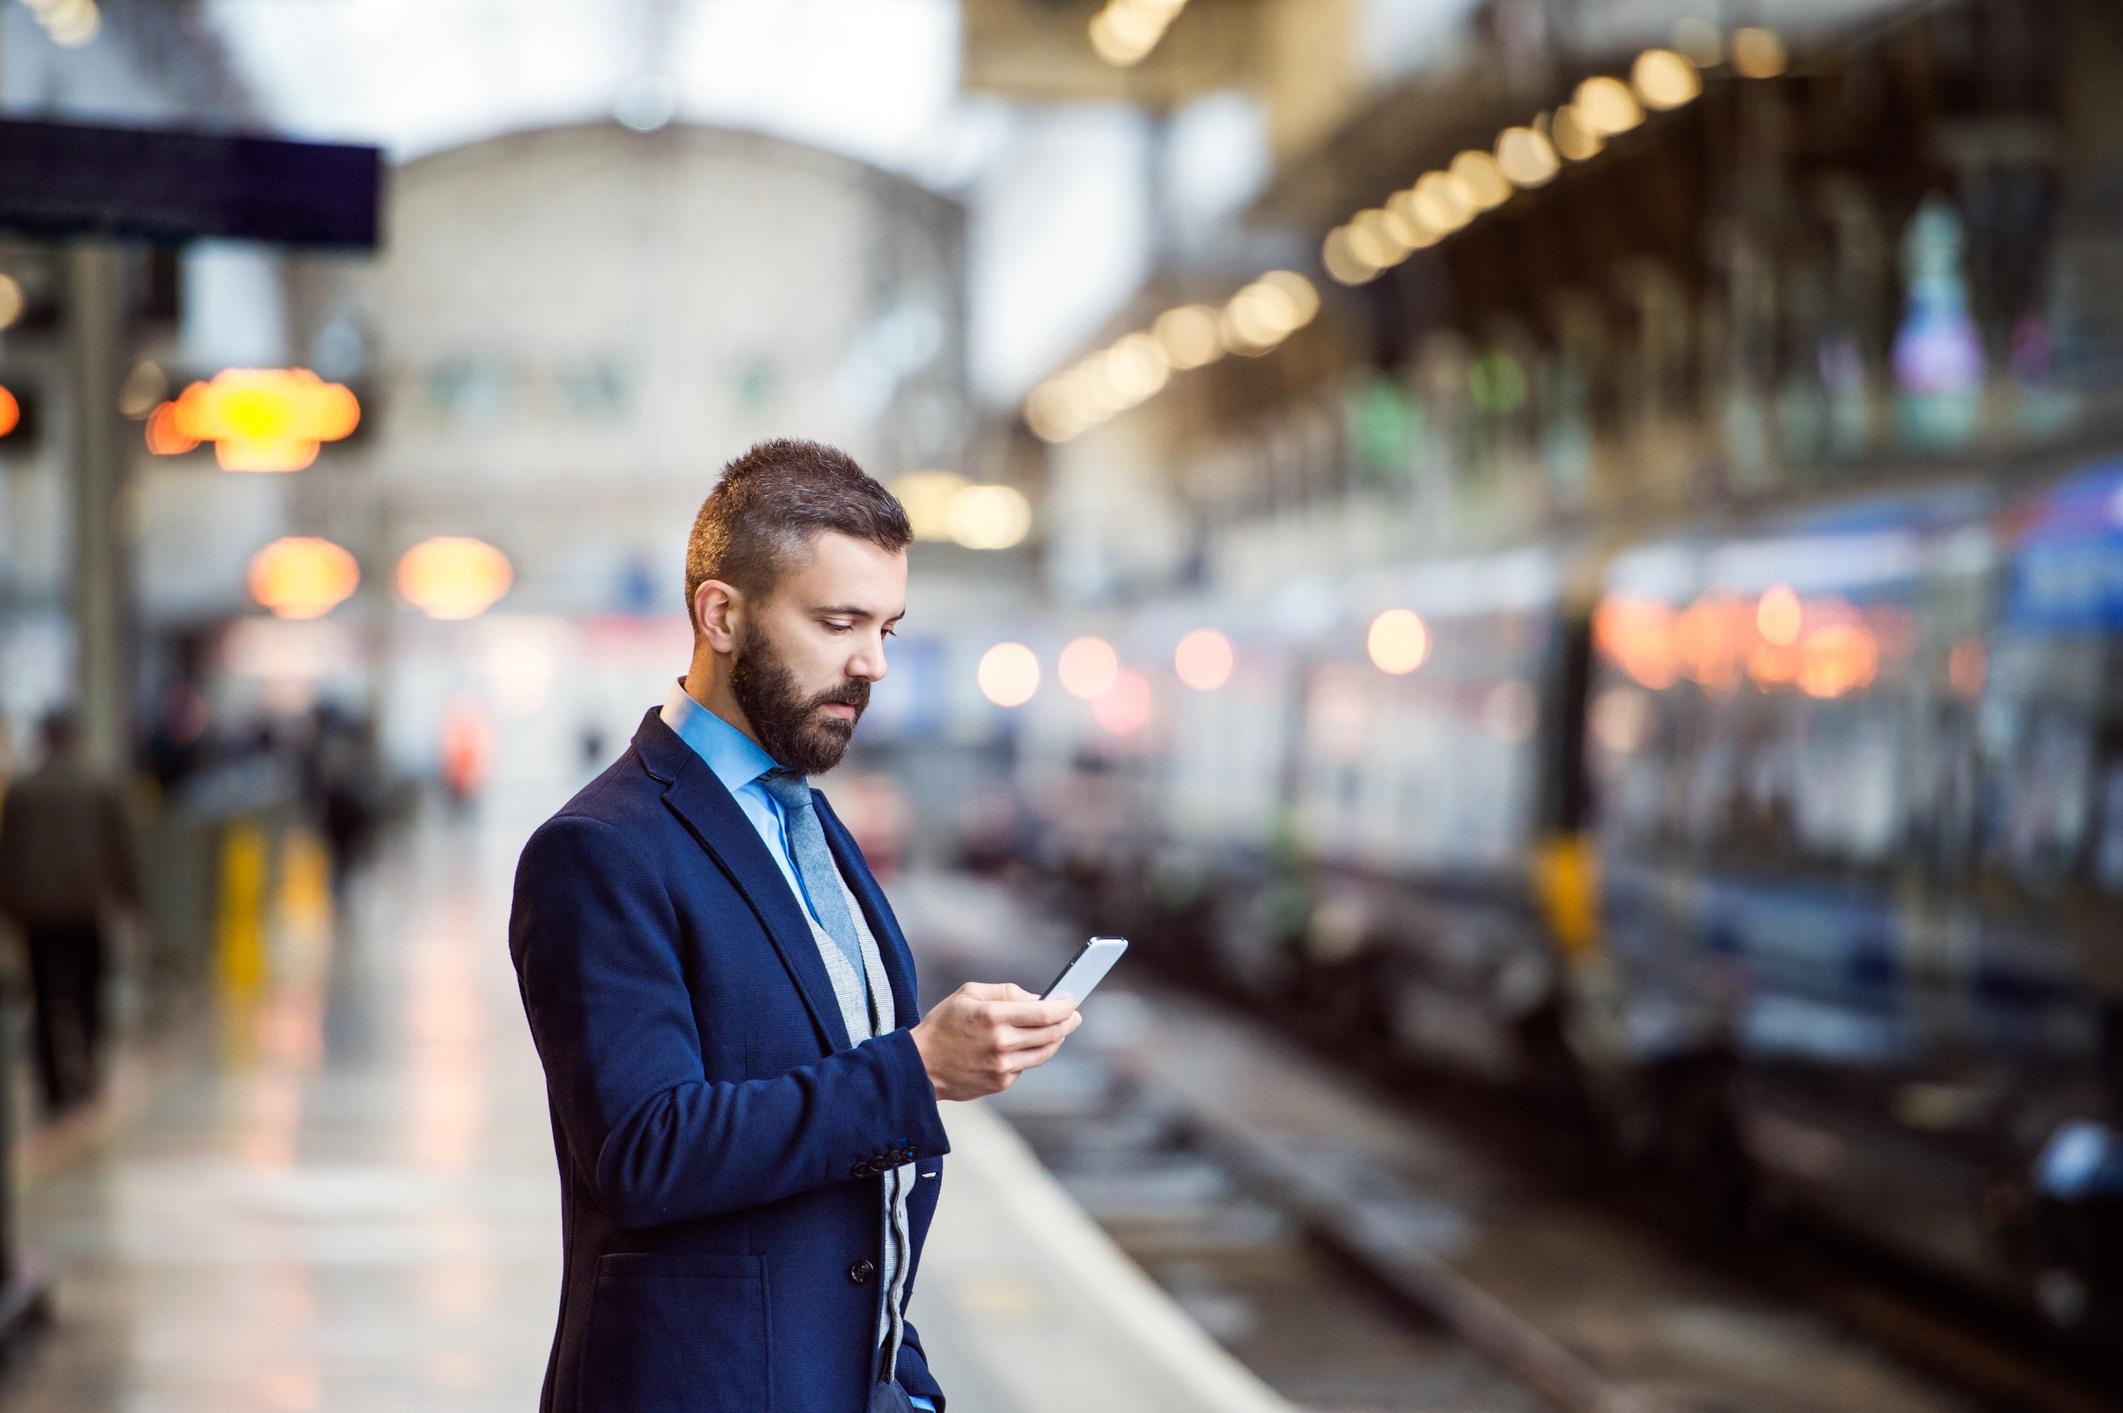 Businessman on smartphone.jpg